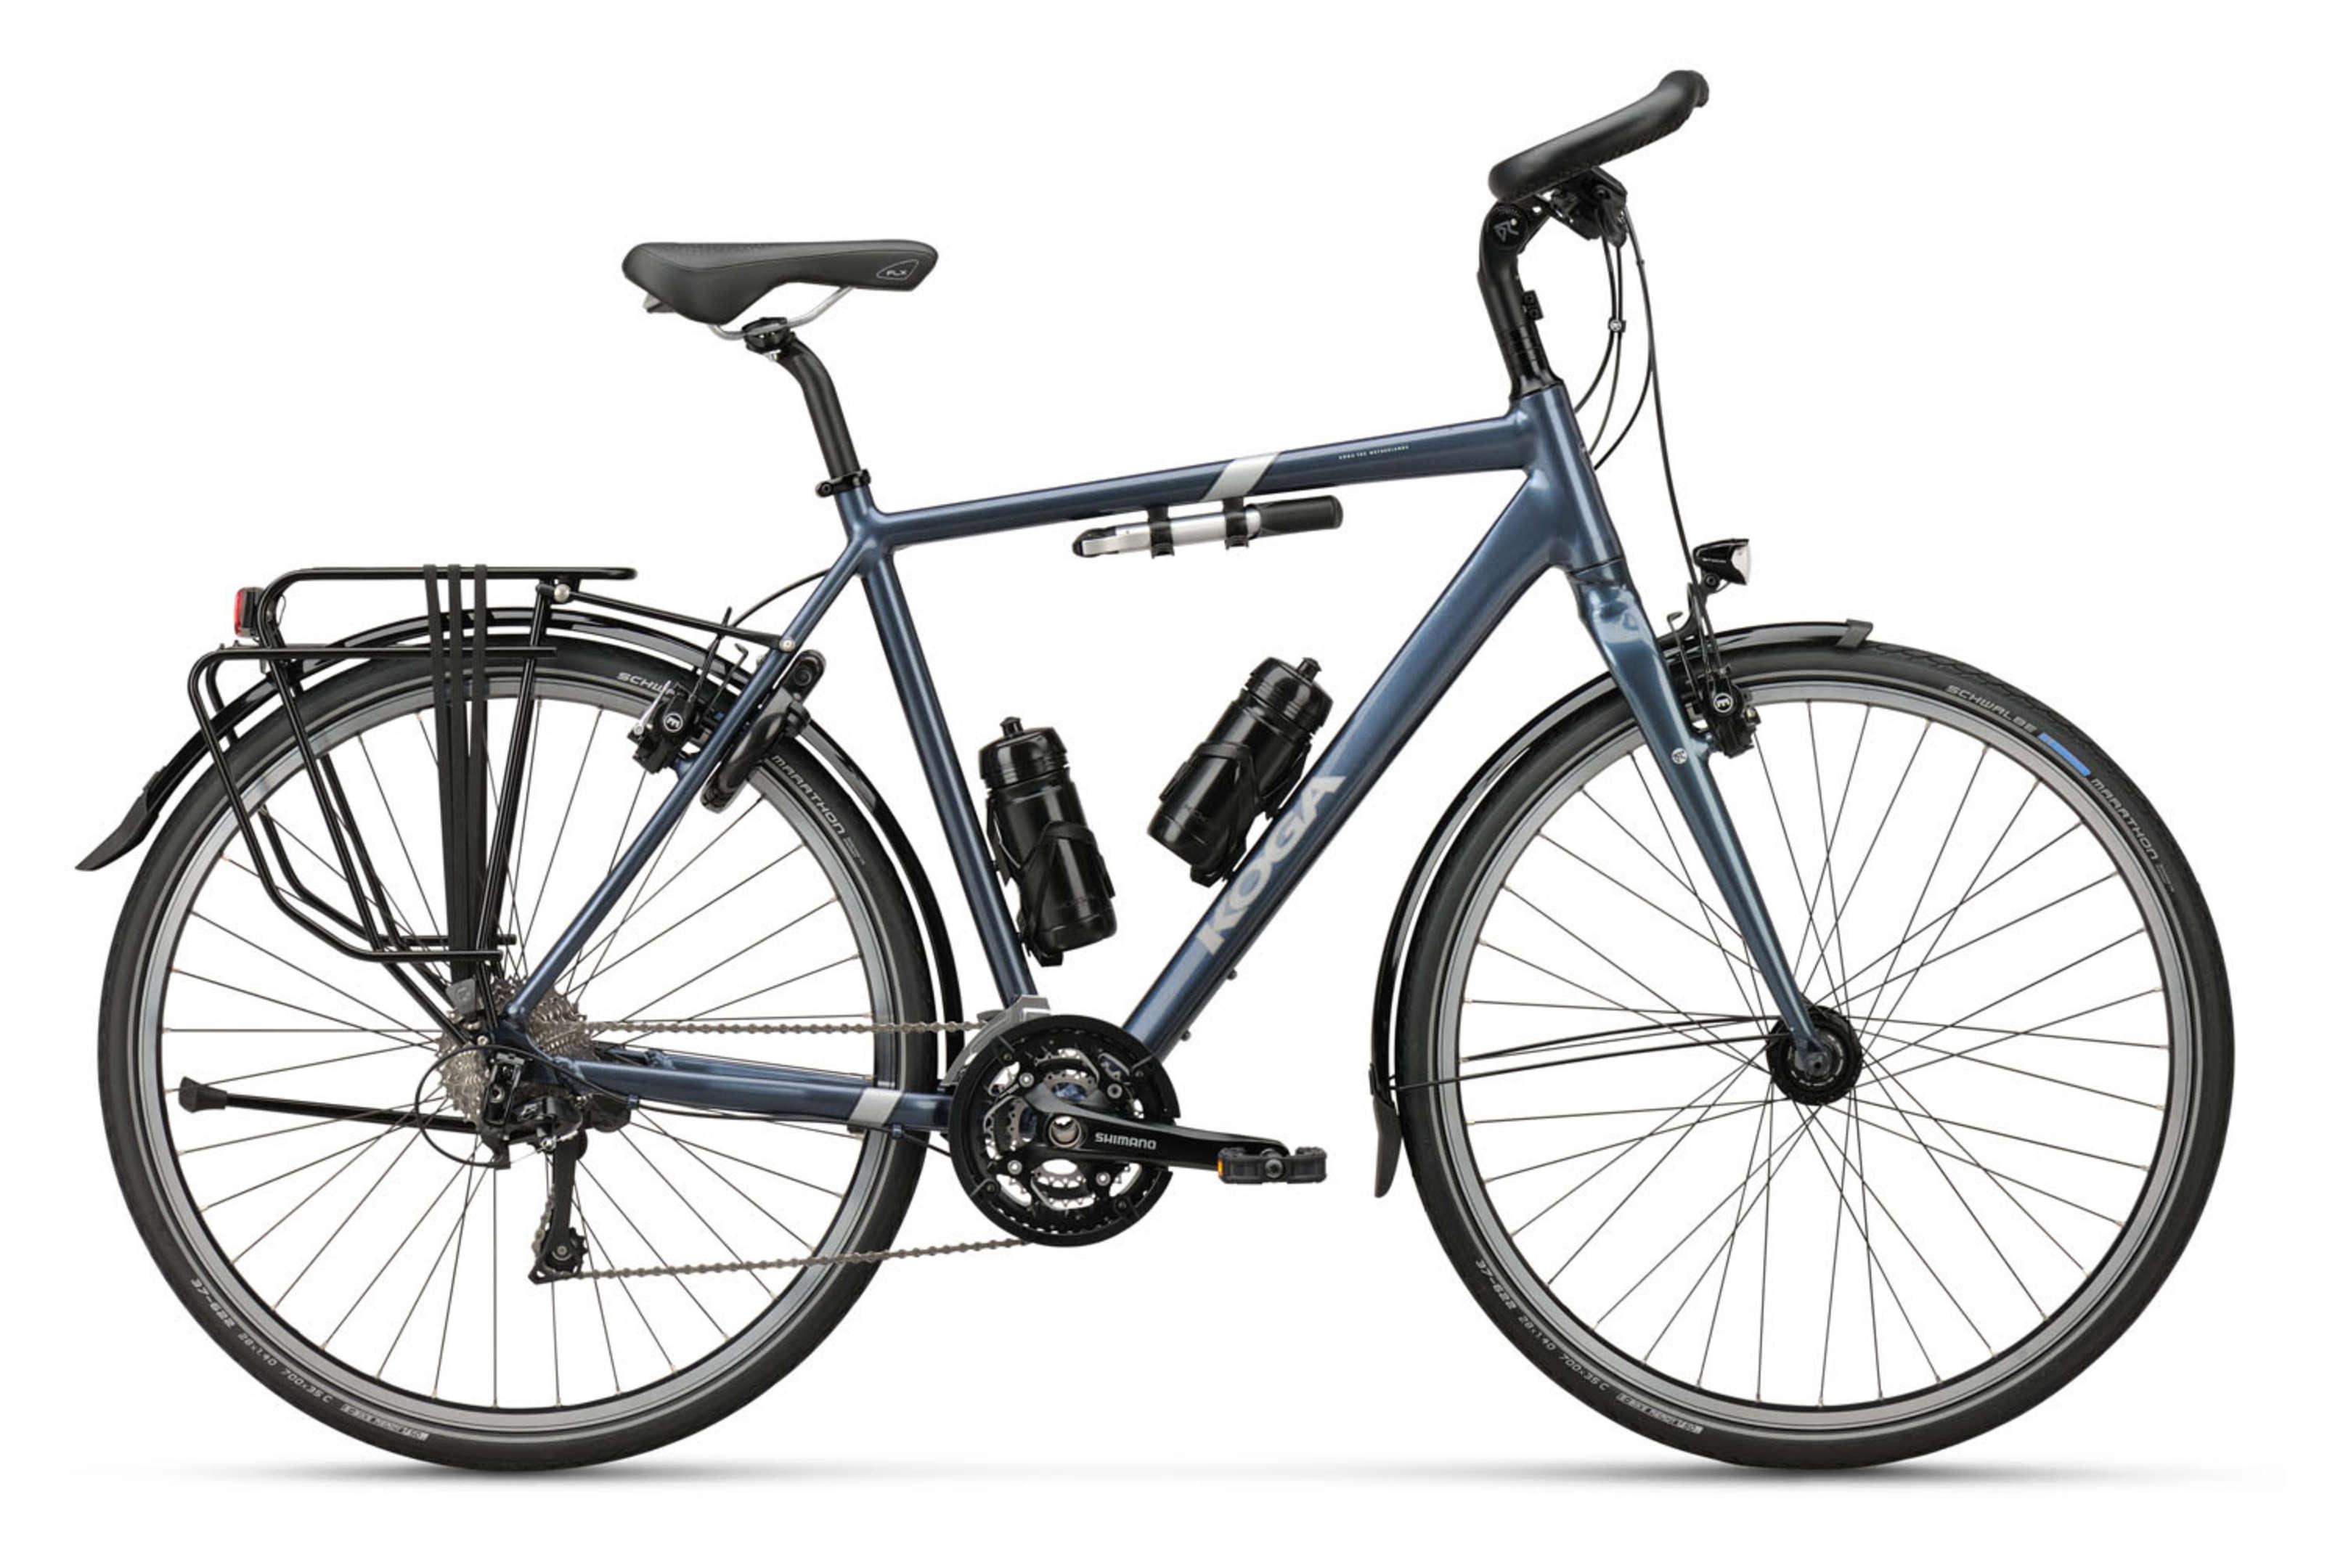 koga trekkingrad grandtourer eurorad bikeleasingeurorad bikeleasing. Black Bedroom Furniture Sets. Home Design Ideas